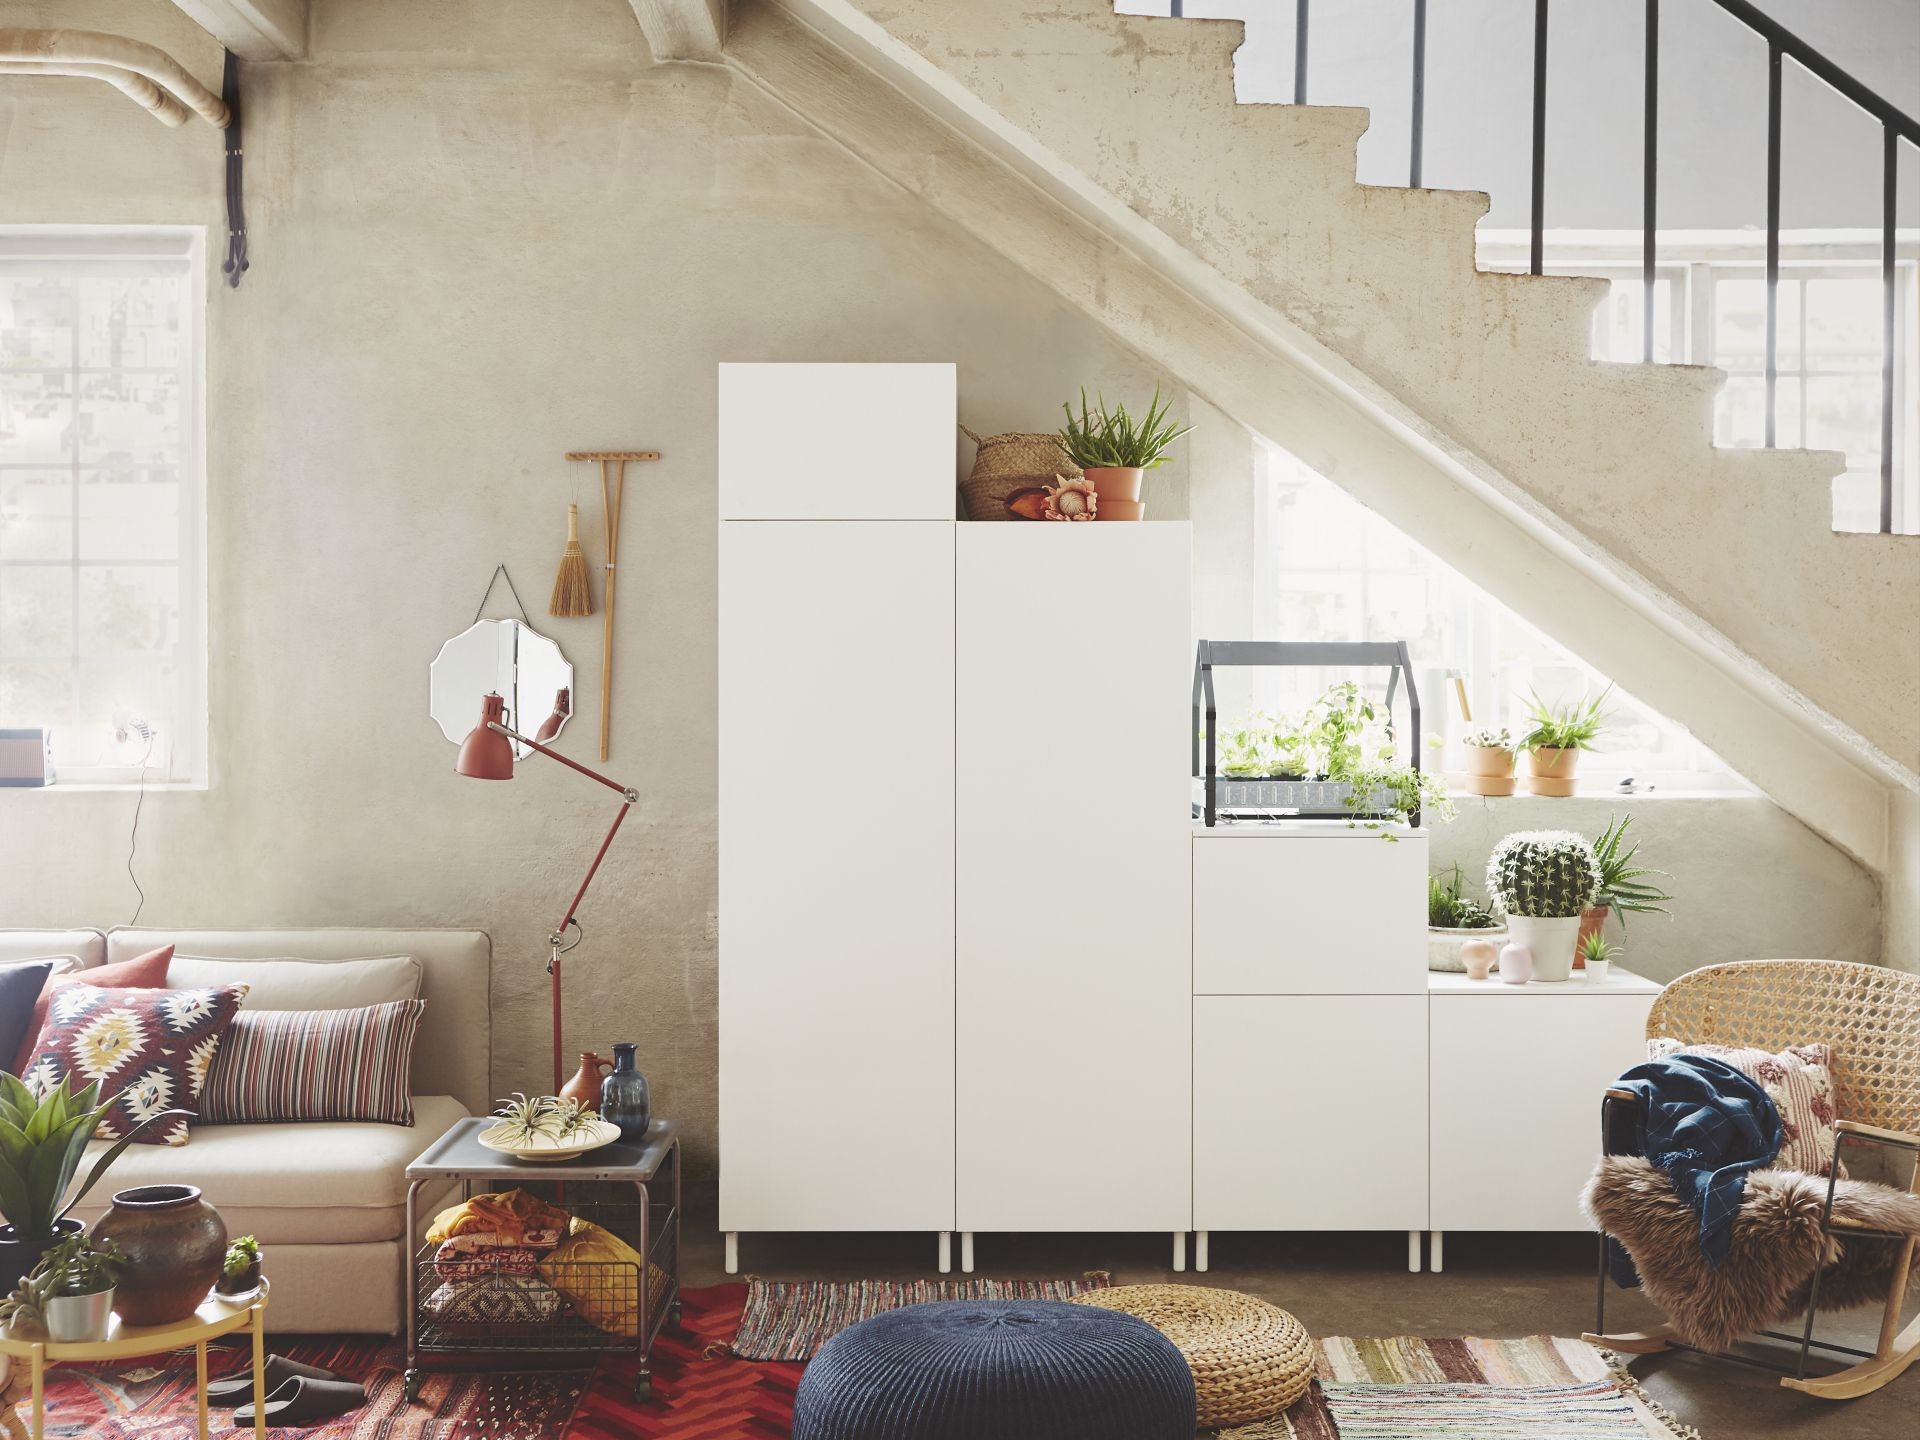 Ikea PLATSA Range   Storage System   Wedge Dowel